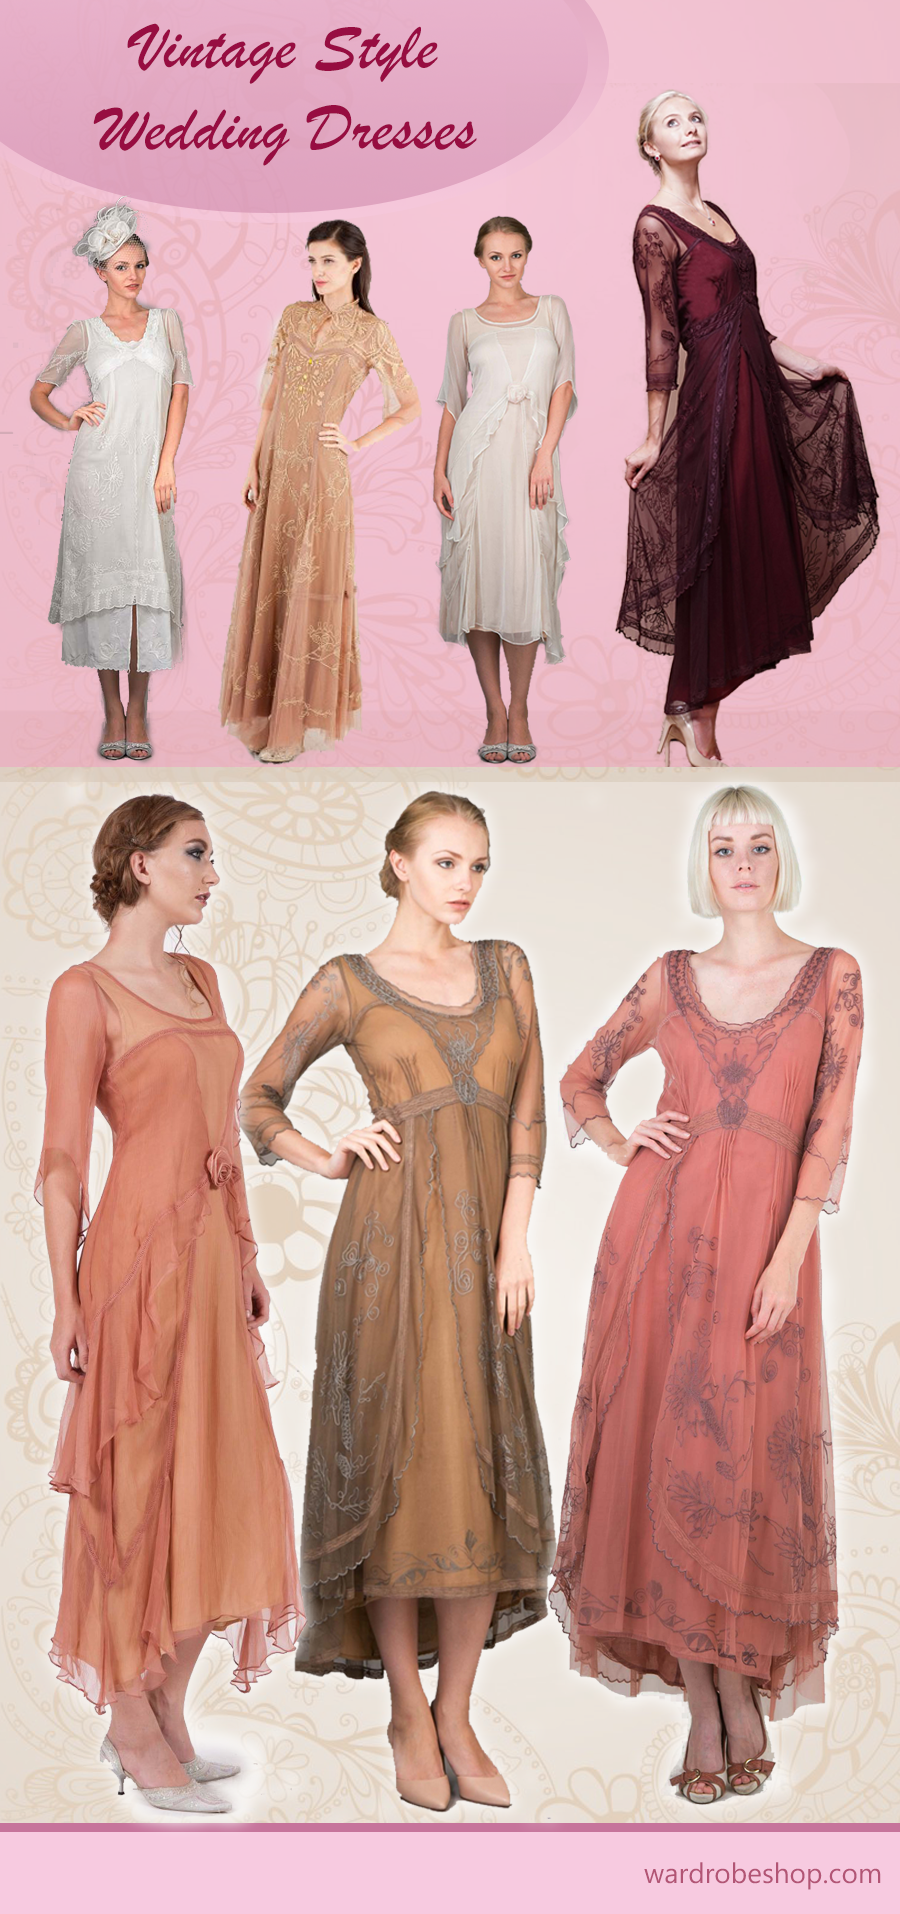 Vintage Style Wedding Dresses | wearable stuff | Pinterest ...